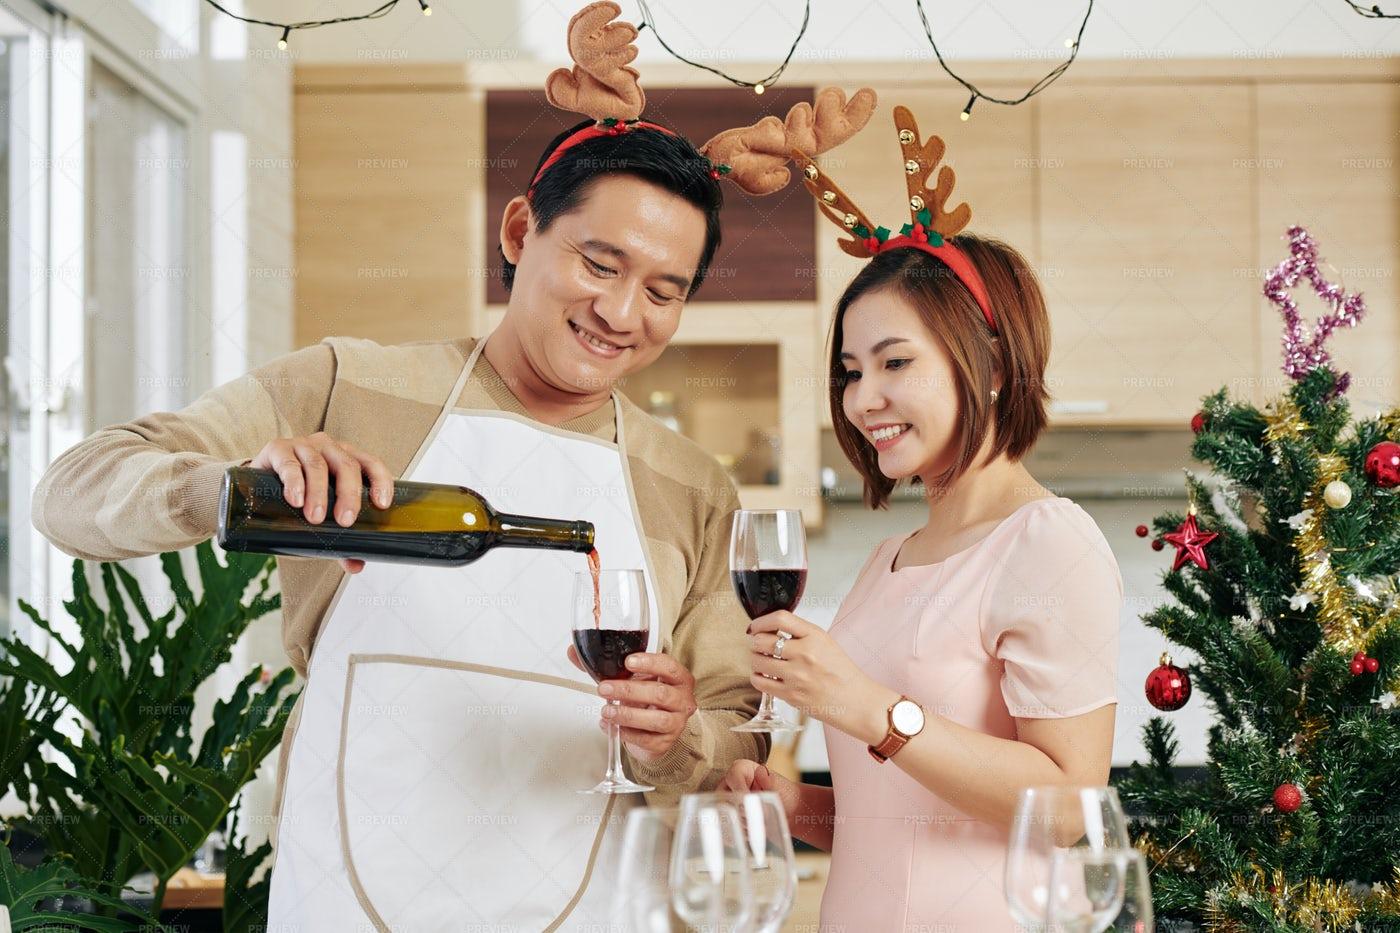 Man Pouring Wine On Christmas Eve: Stock Photos